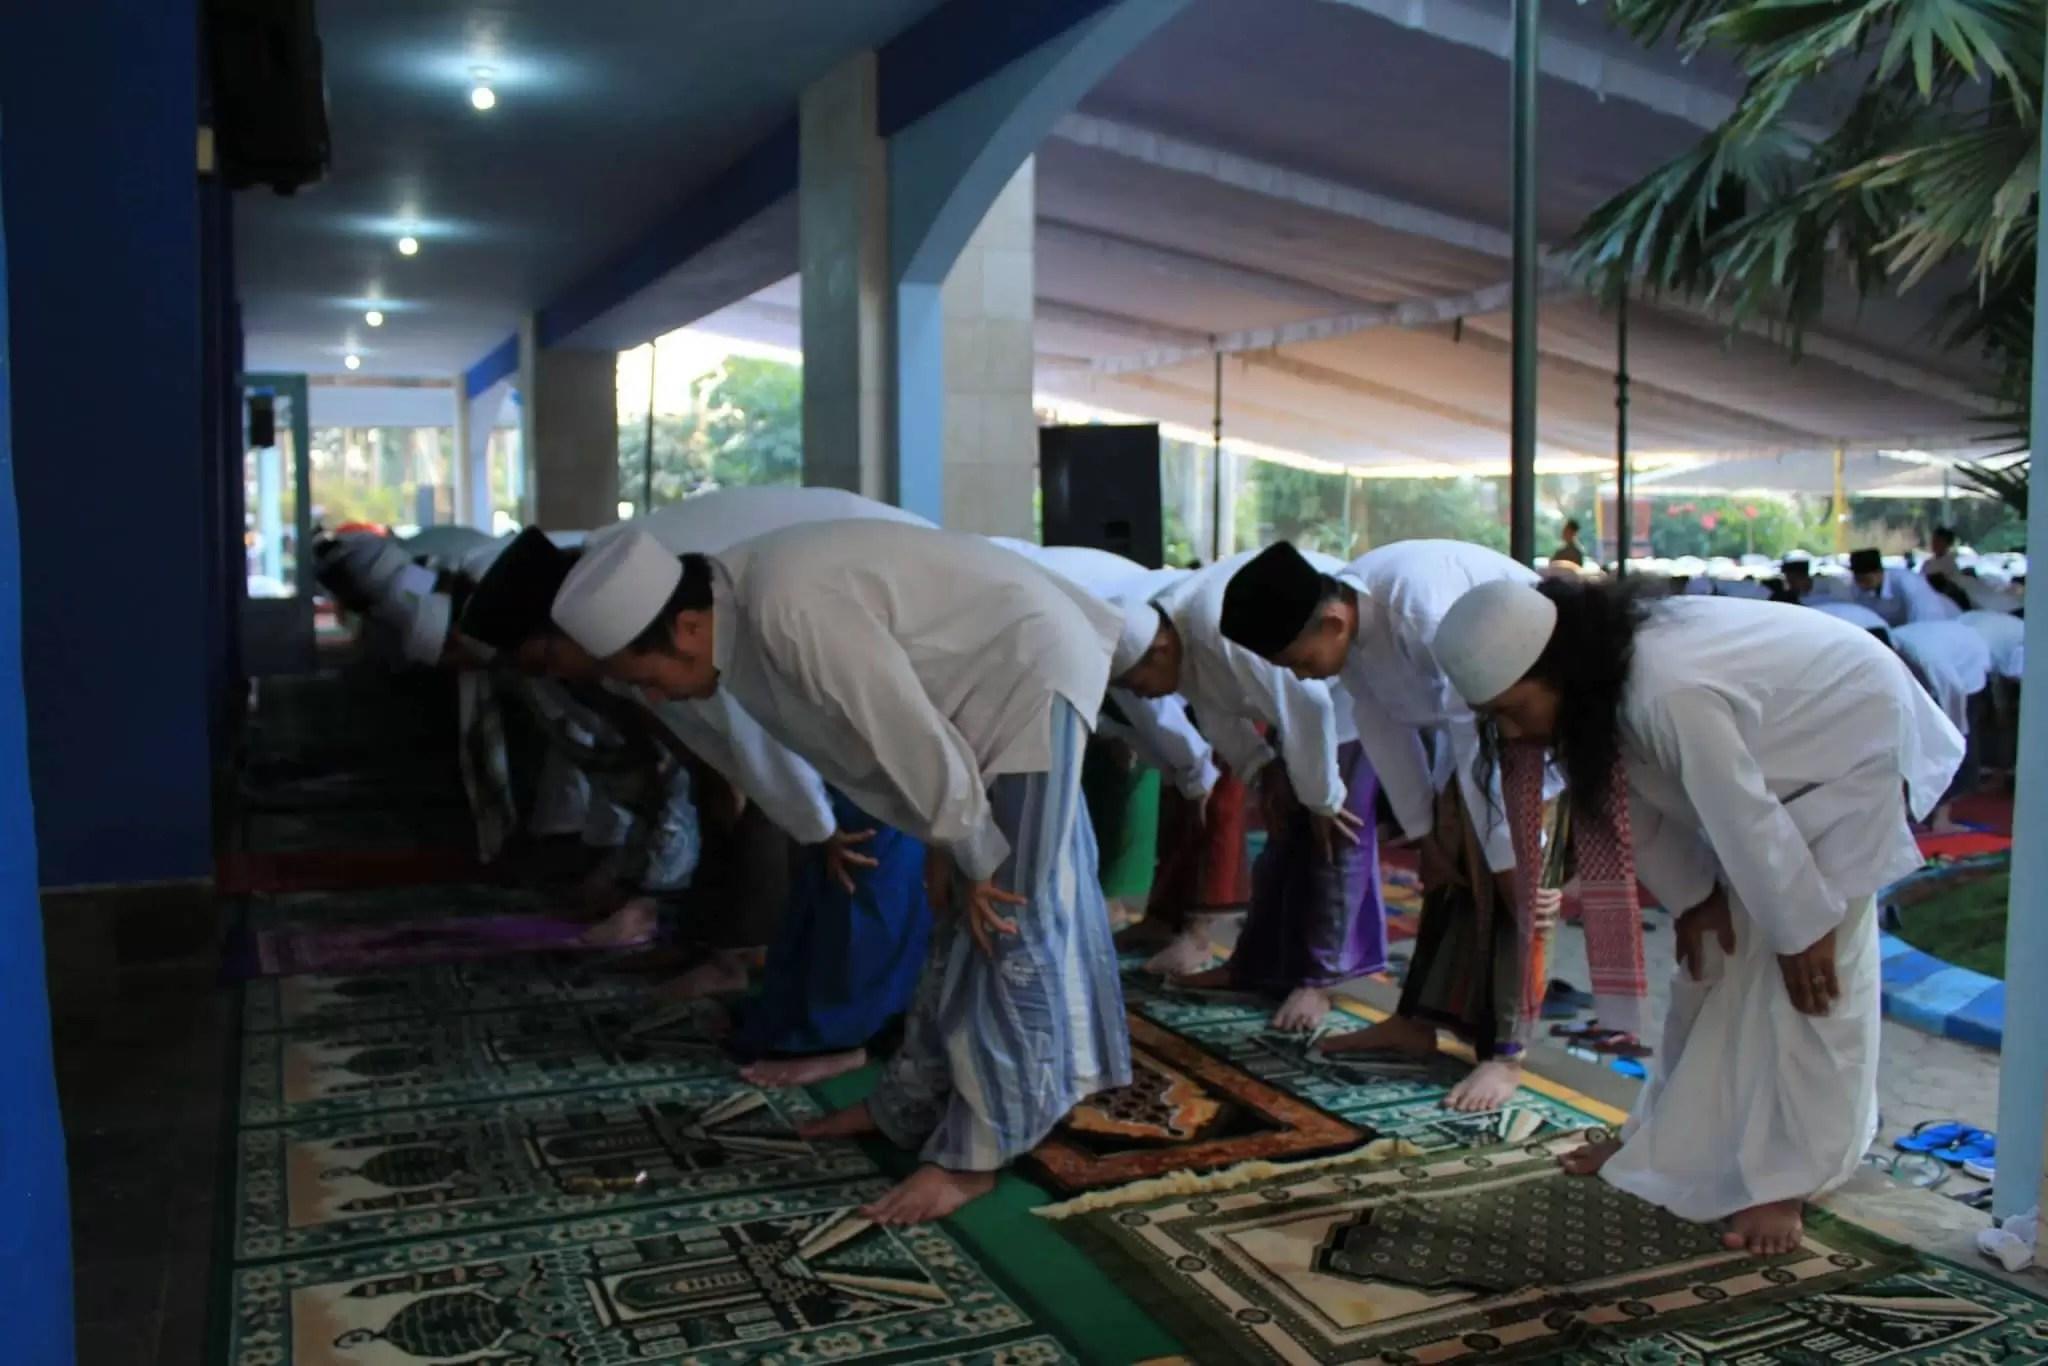 qiblat, Sahkah Shalatnya Orang Indonesia?, Pondok Pesantren Wisata An-Nur II Al Murtadlo